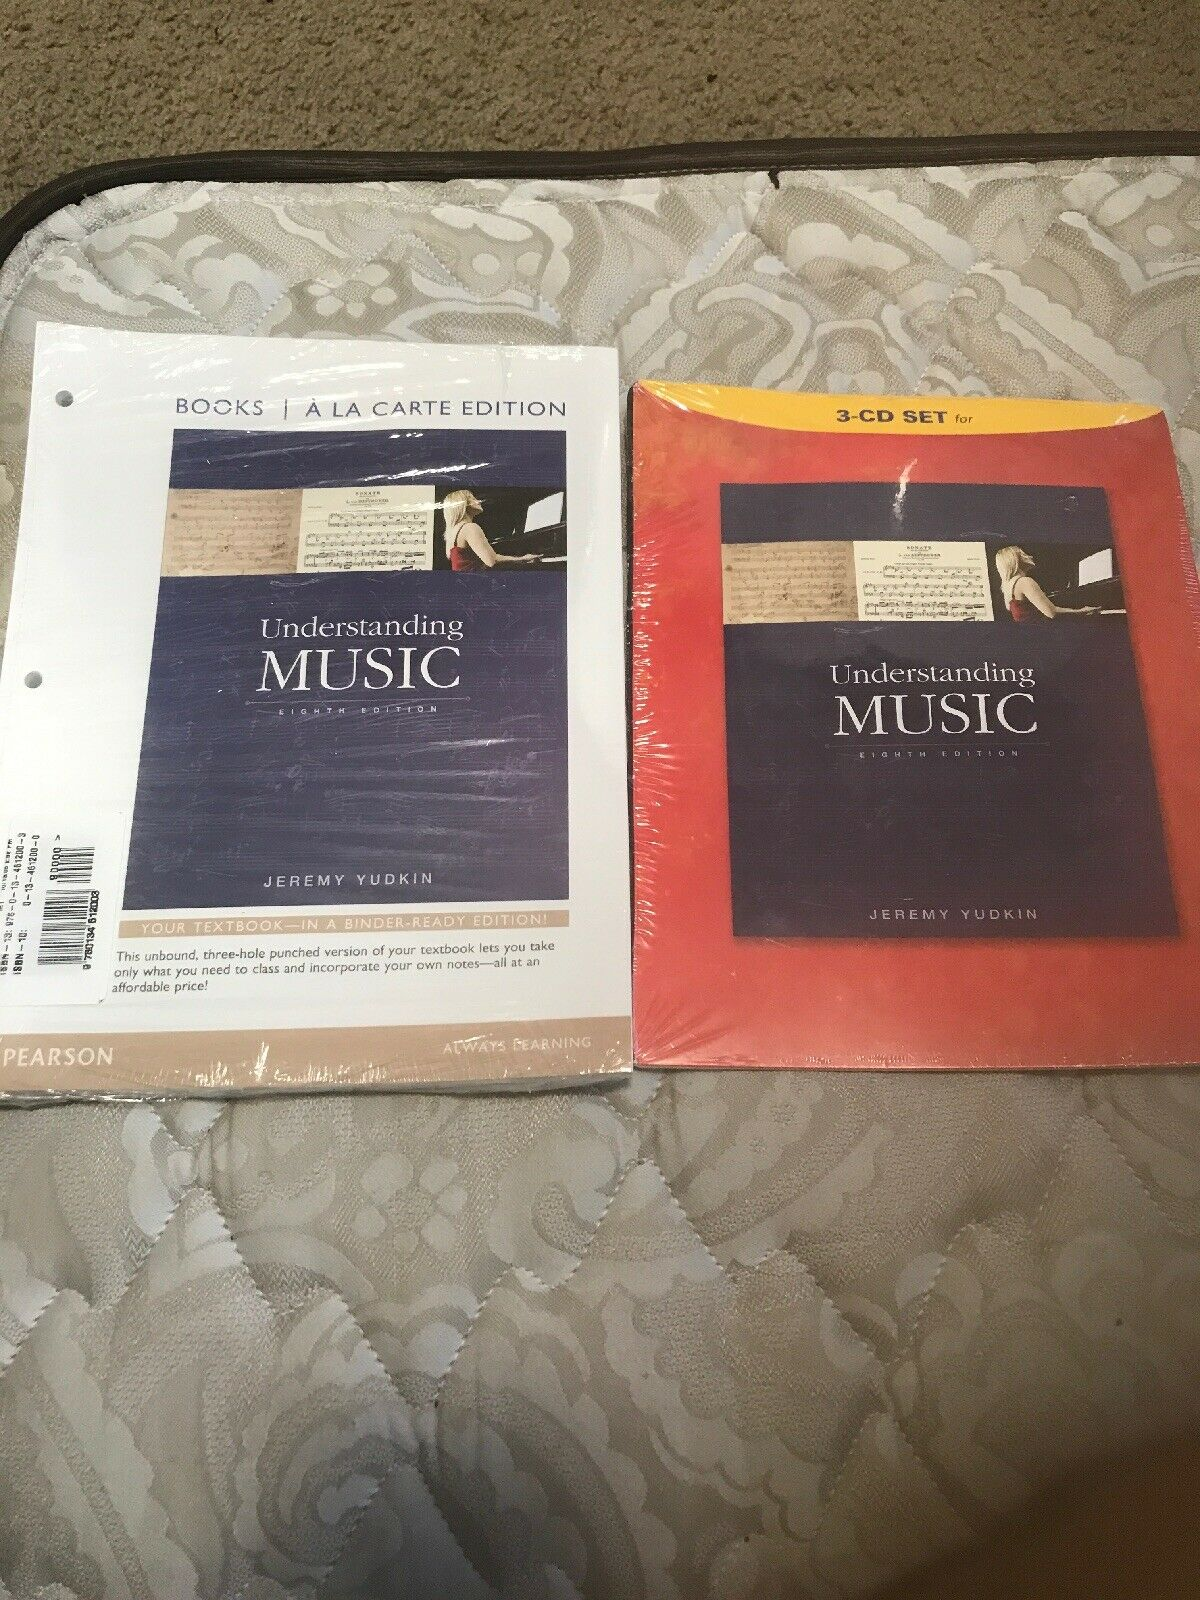 Understanding Music 3cd Set For Understanding Music By Jeremy Yudkin 2015 Cd Rom Trade Paperback For Sale Online Ebay